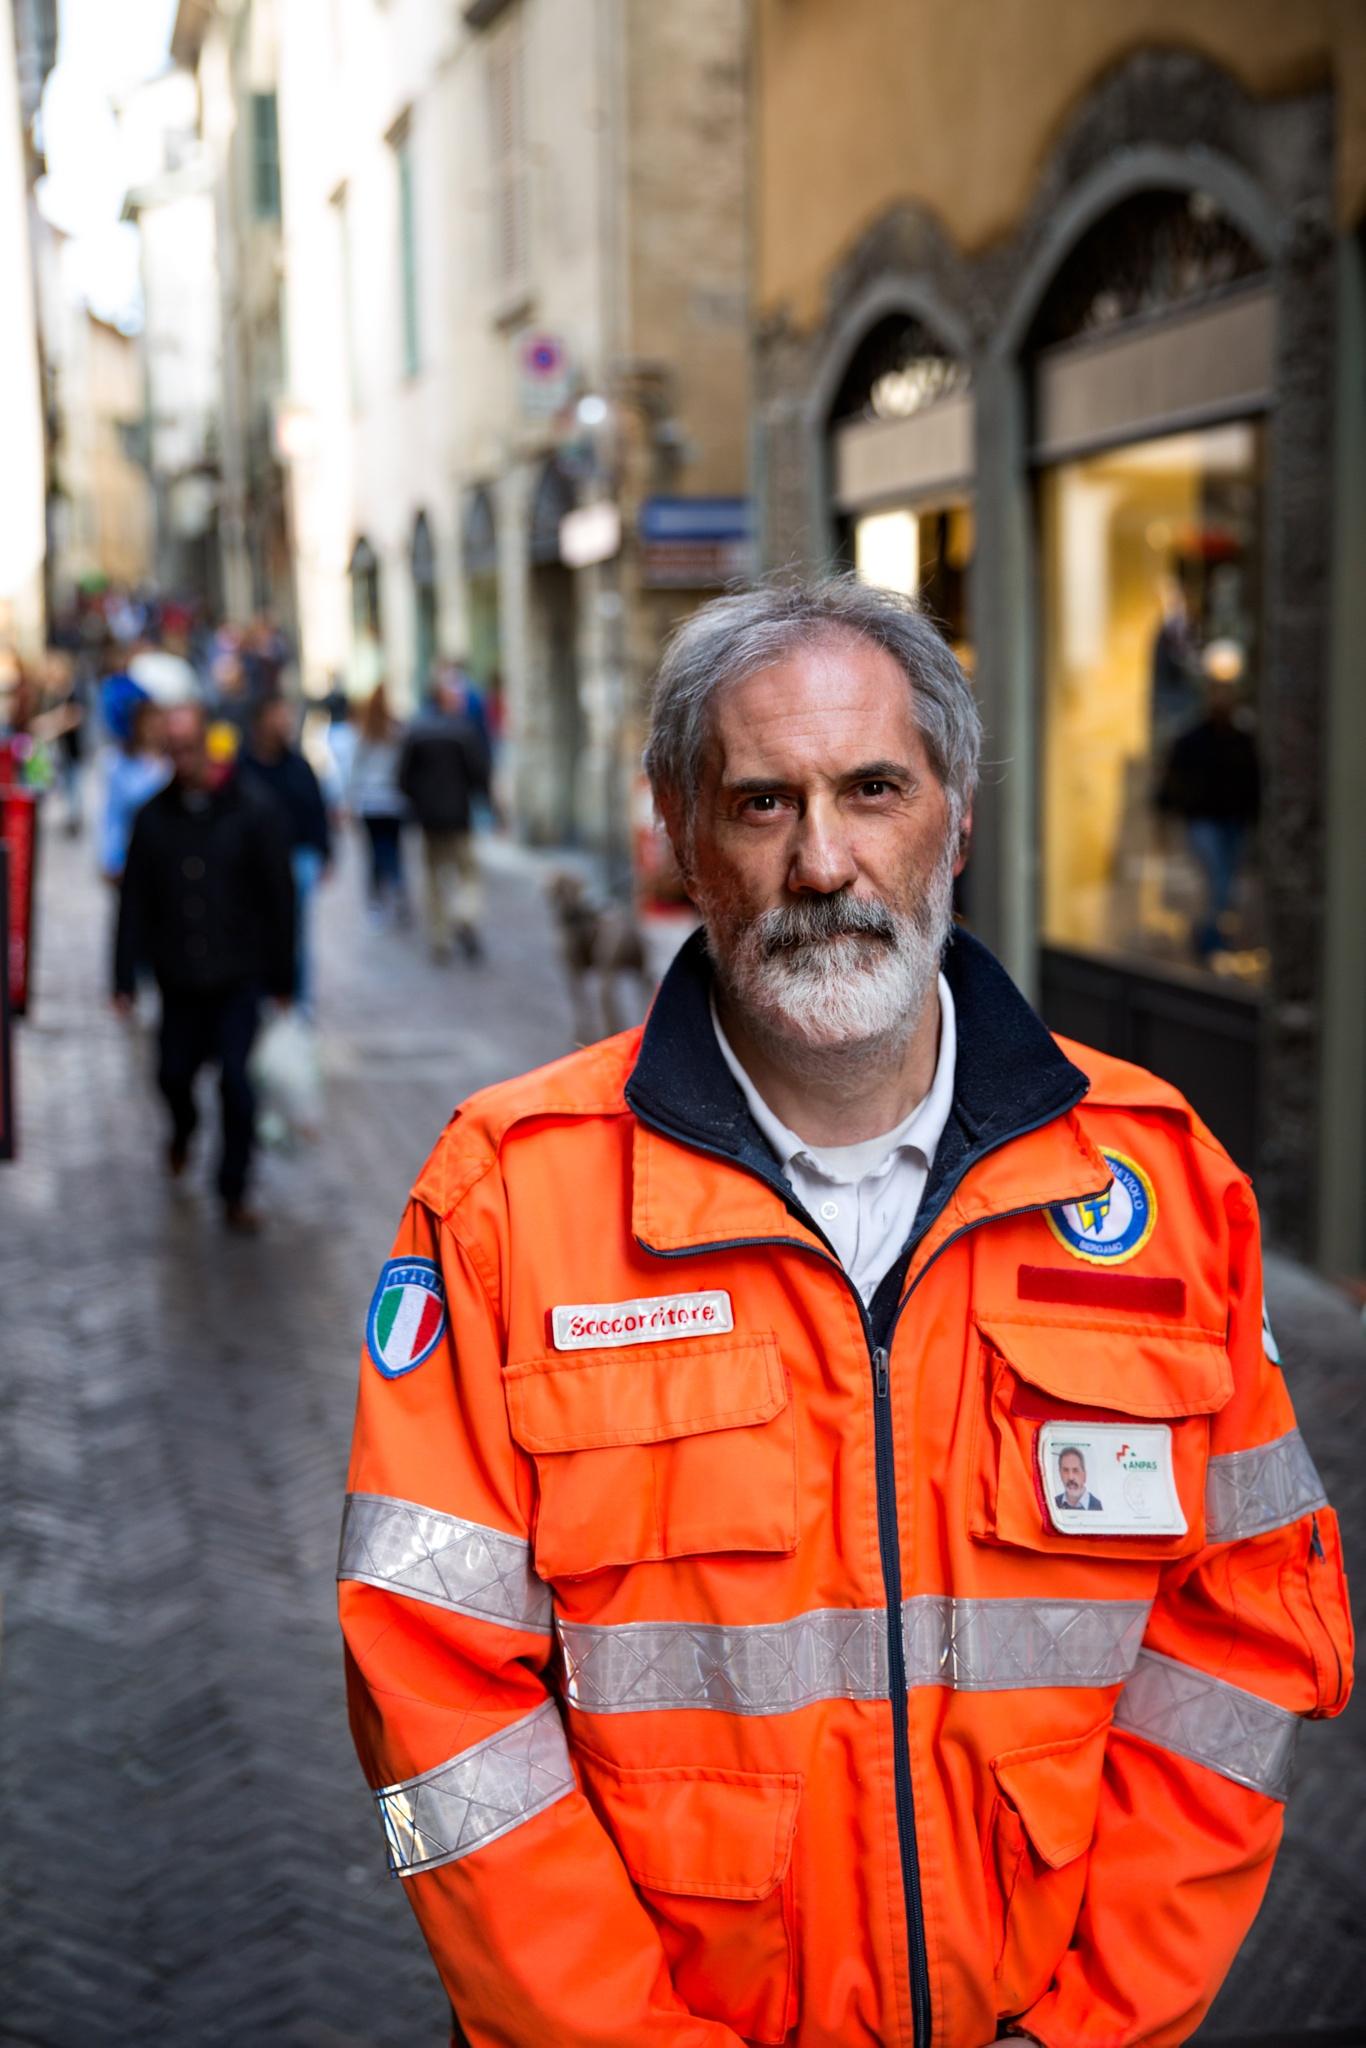 The rescue man by Francesco Cinque